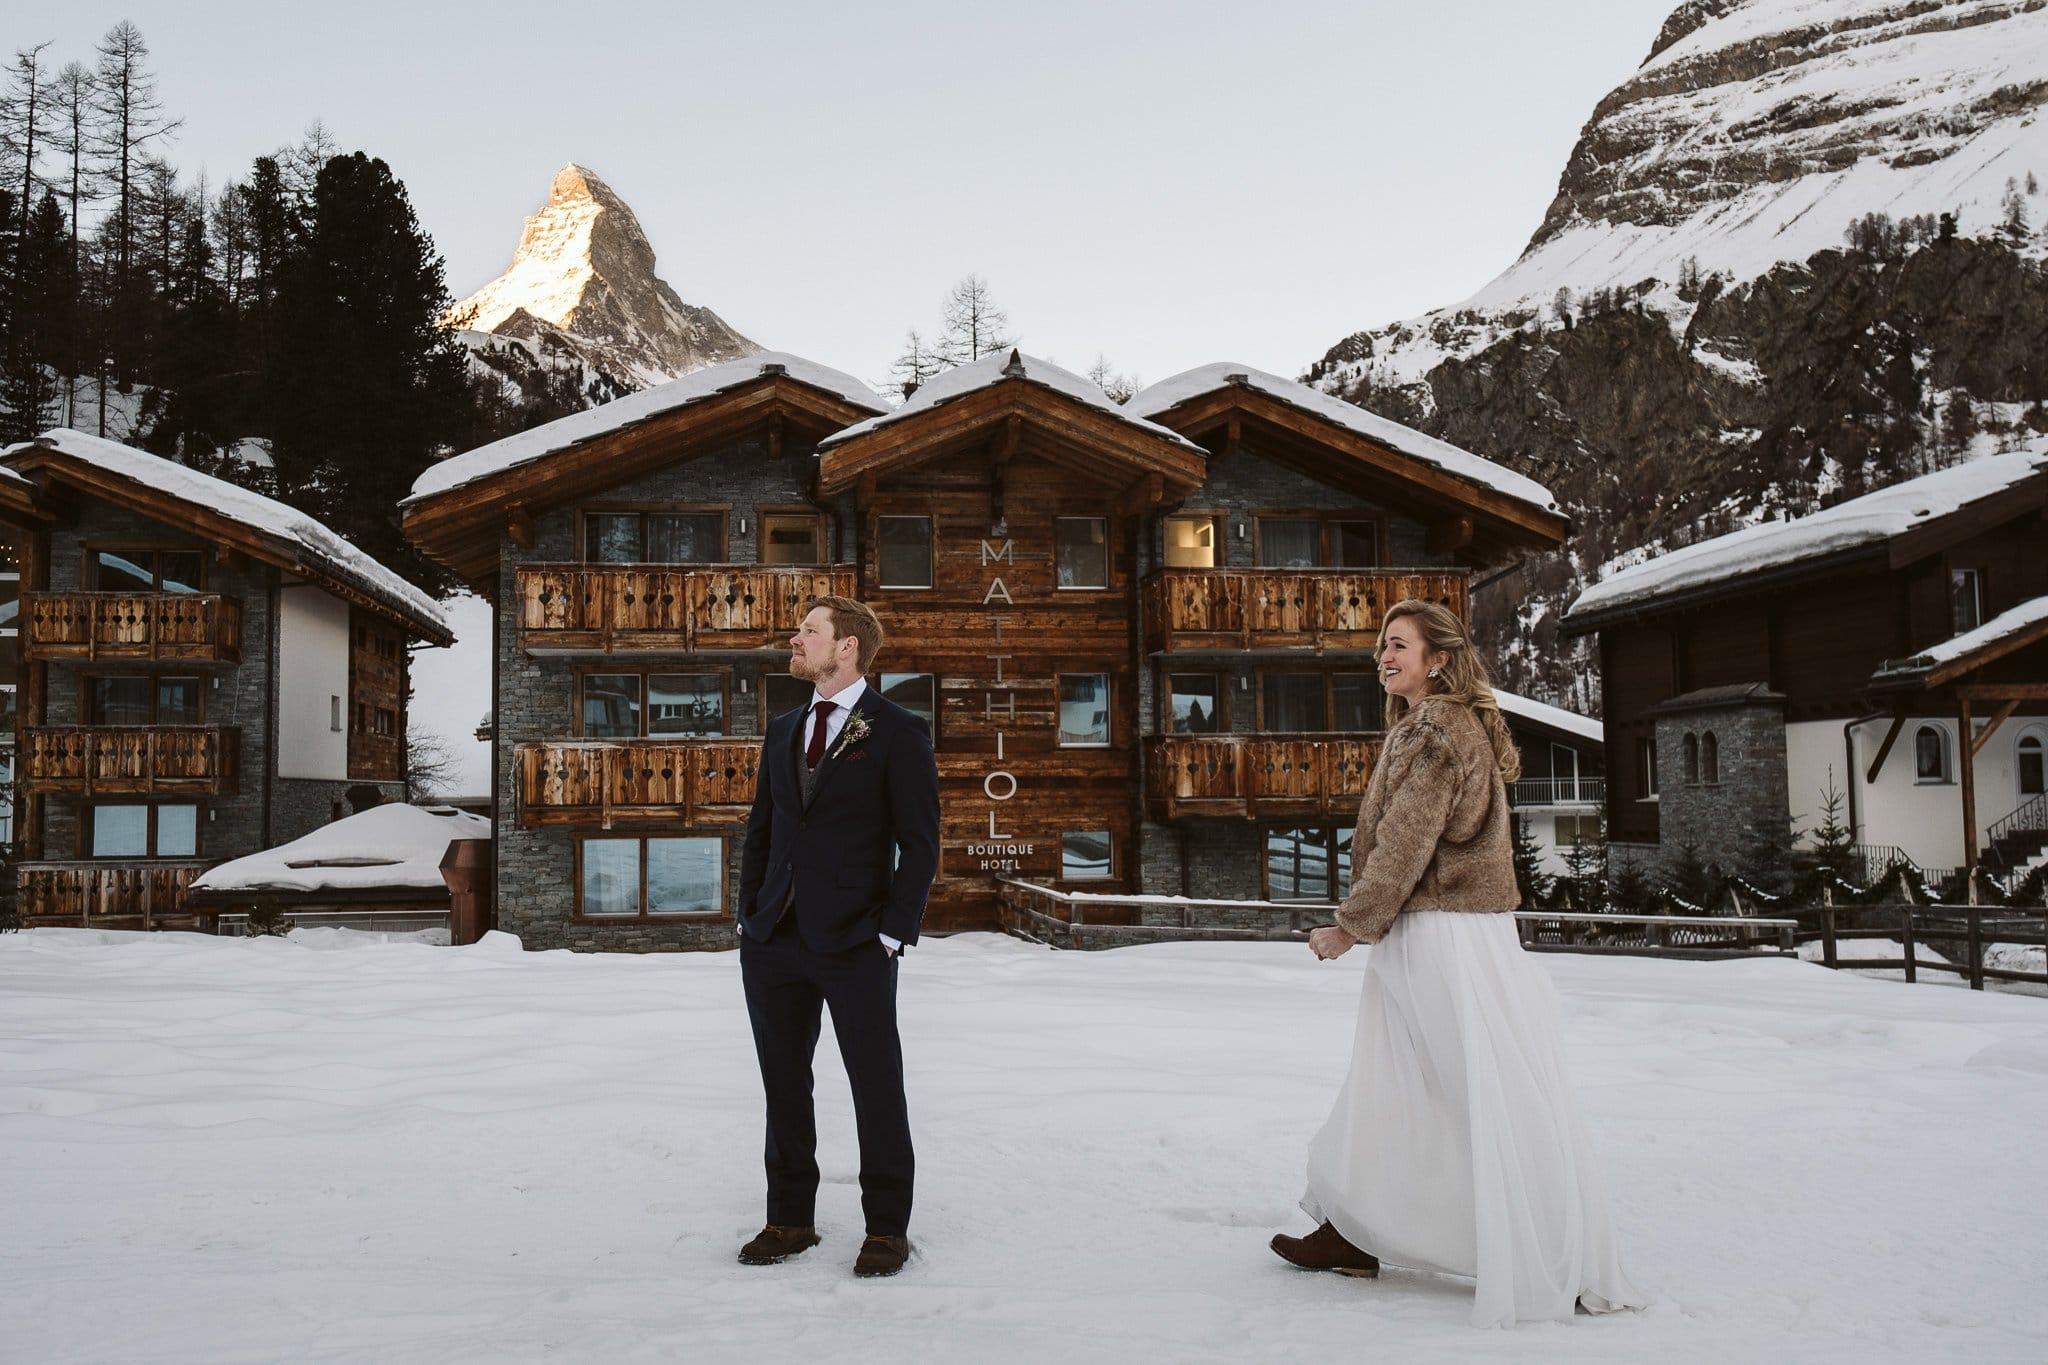 Bride and groom first look outside of Matthiol Boutique Hotel in Zermatt. Switzerland adventure elopement at Matterhorn.